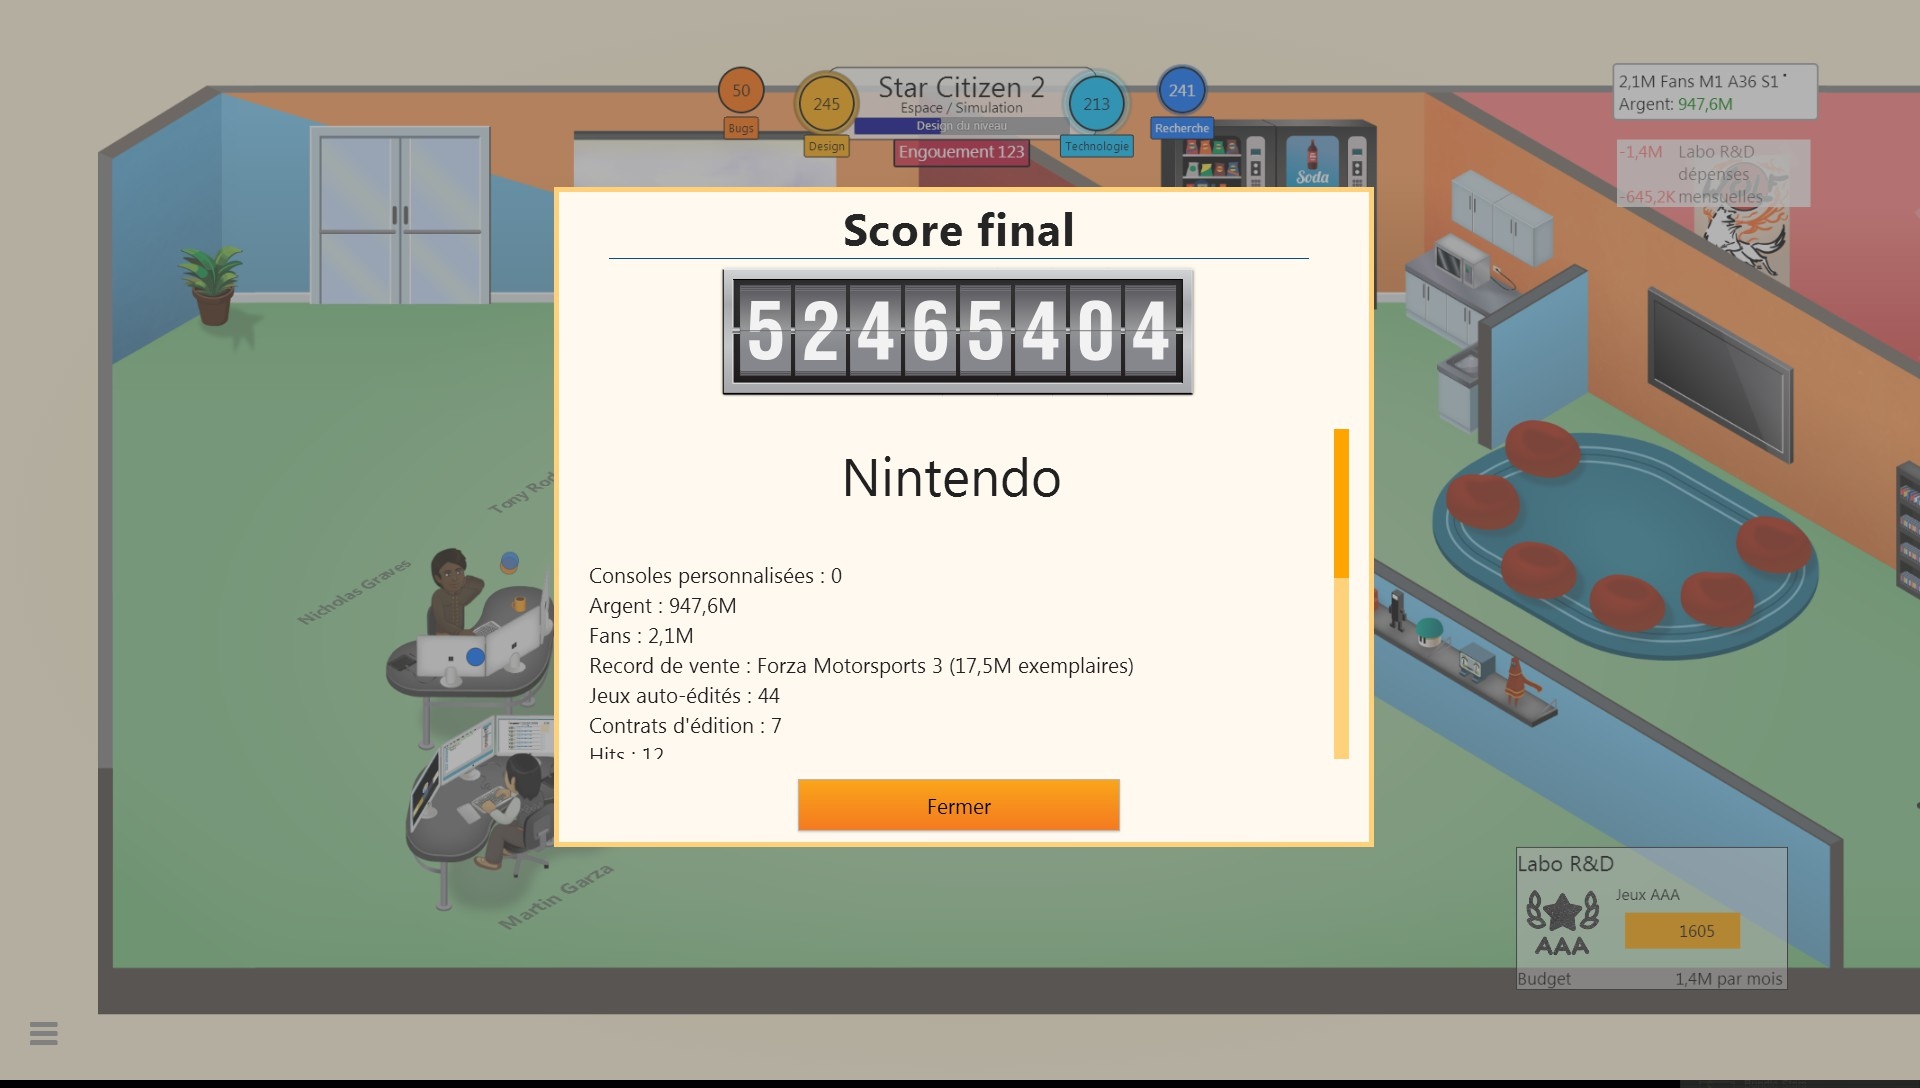 Mantalow: Game Dev Tycoon (PC) 52,465,404 points on 2015-05-25 11:49:56